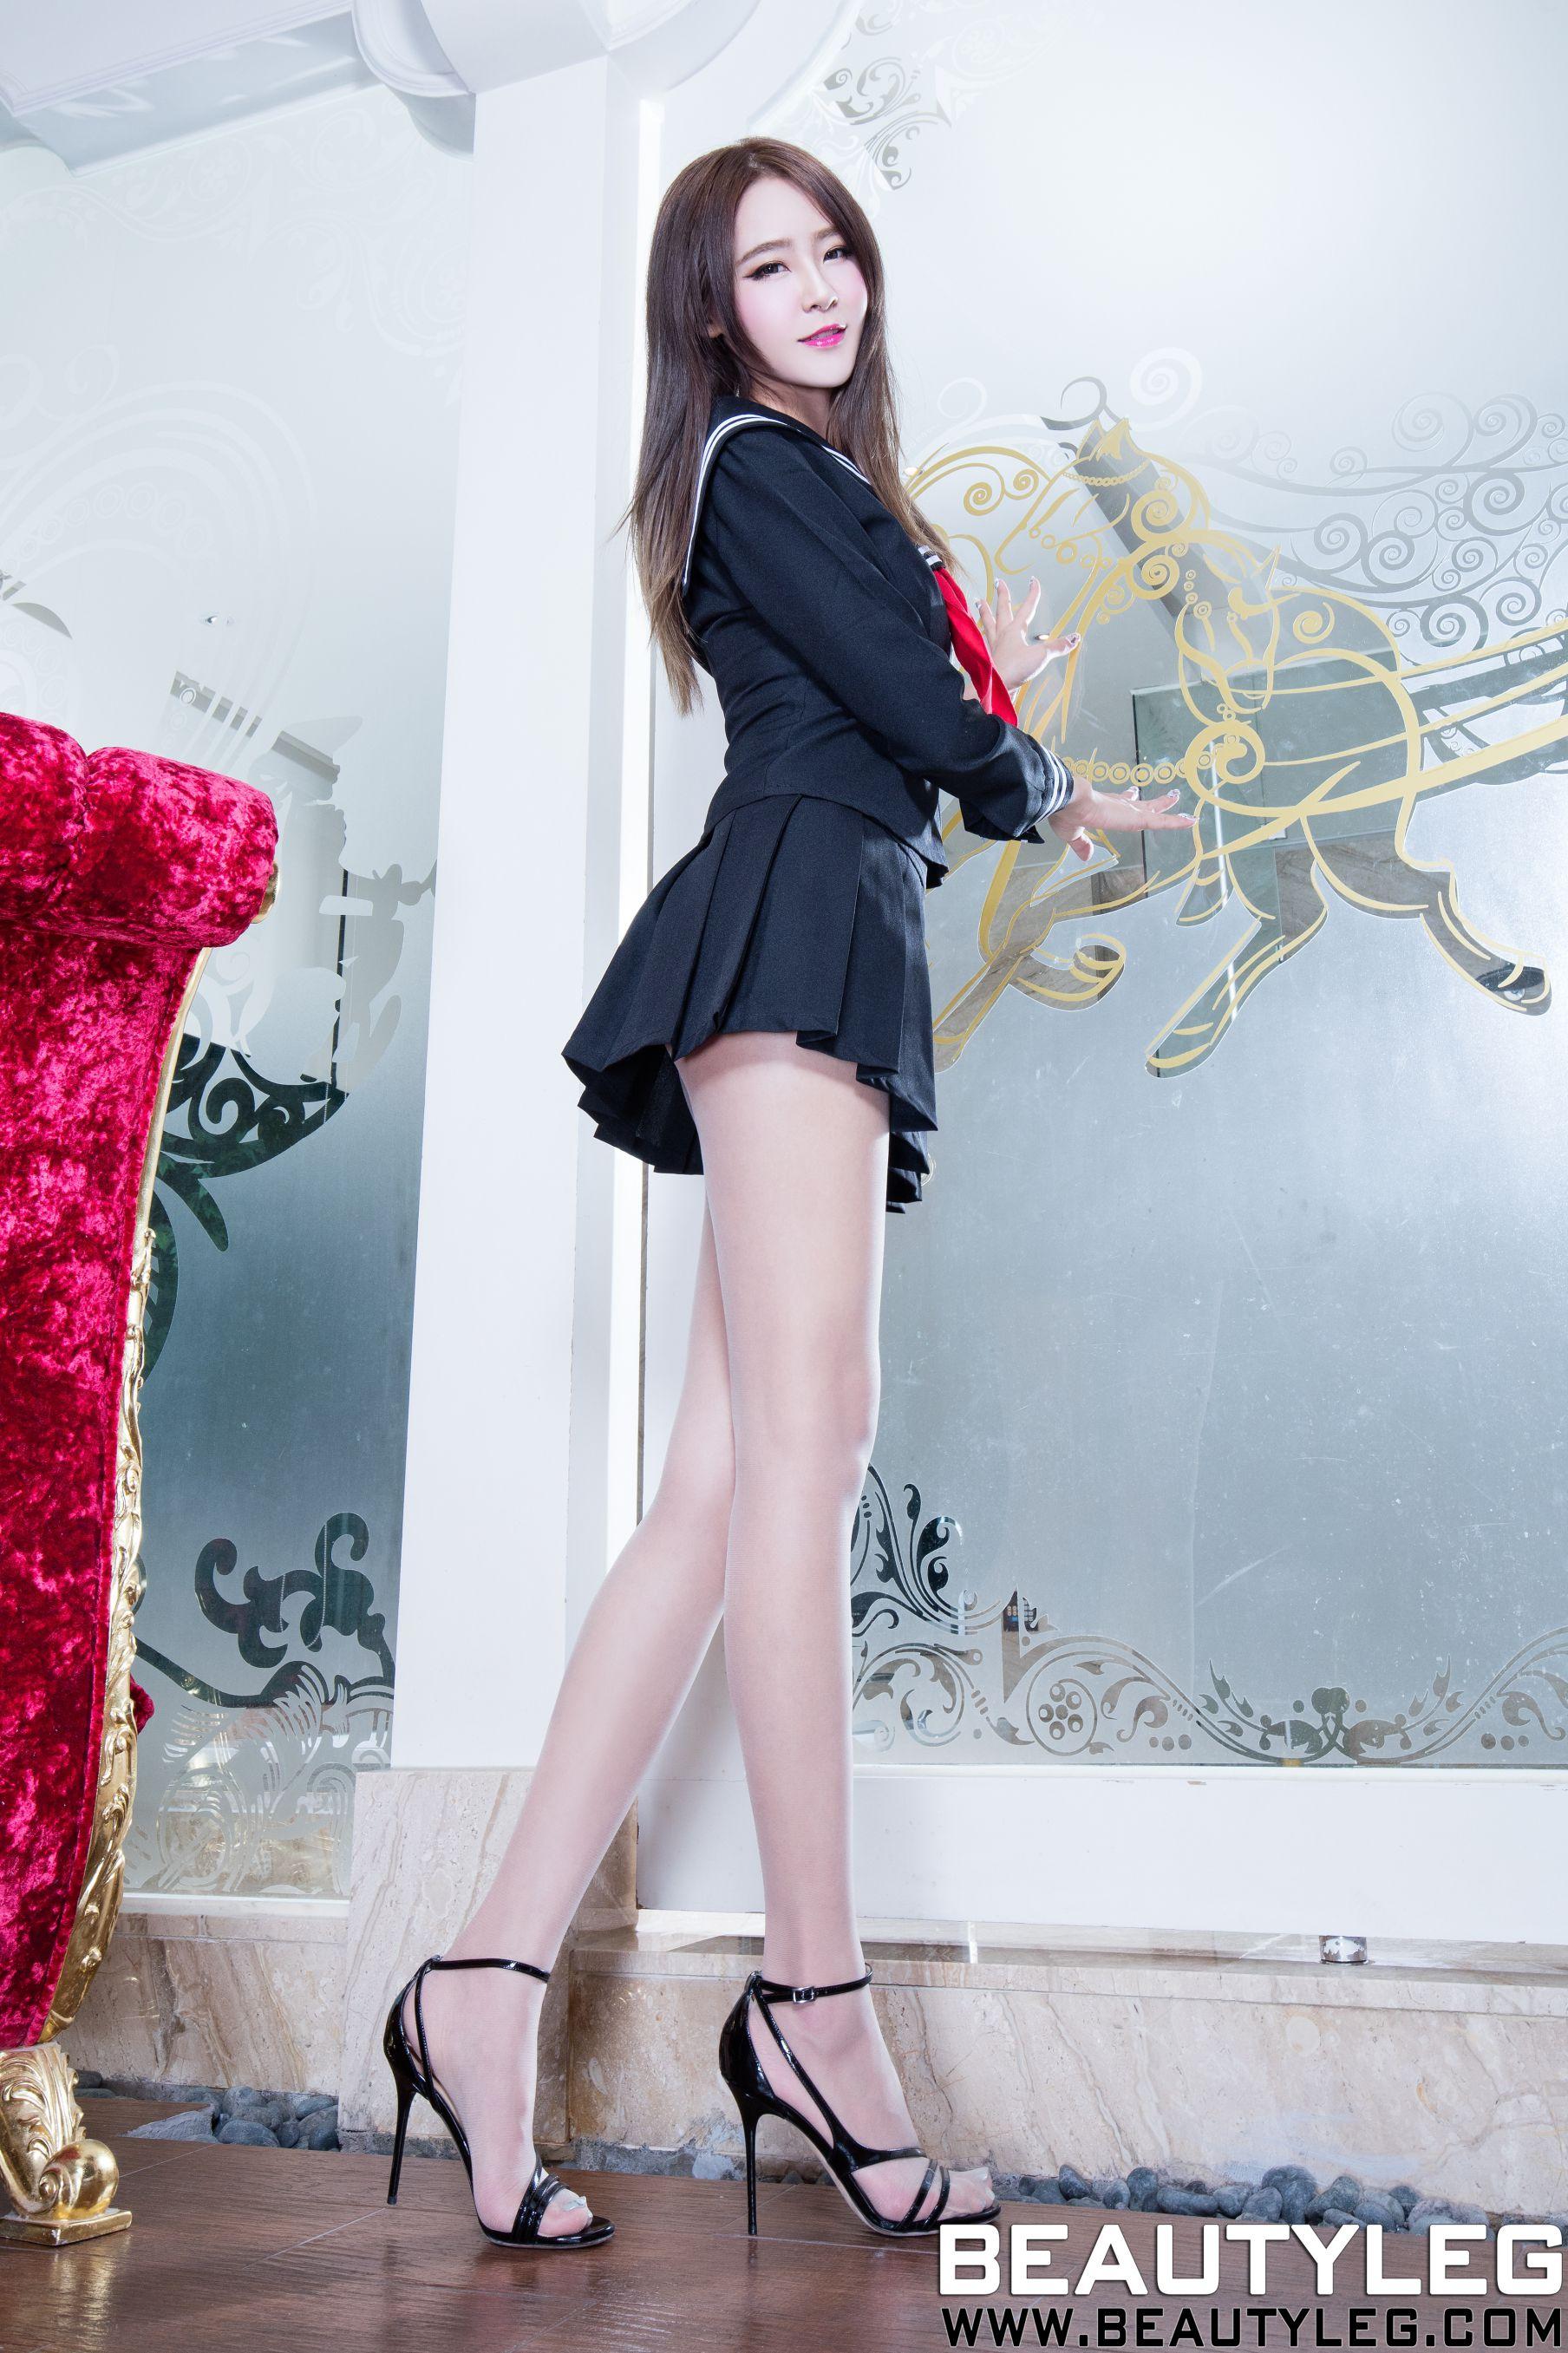 VOL.298 [Beautyleg]校服水手服腿模长腿美女:Winnie小雪(庄咏惠,庄温妮,腿模Winnie)高品质写真套图(42P)